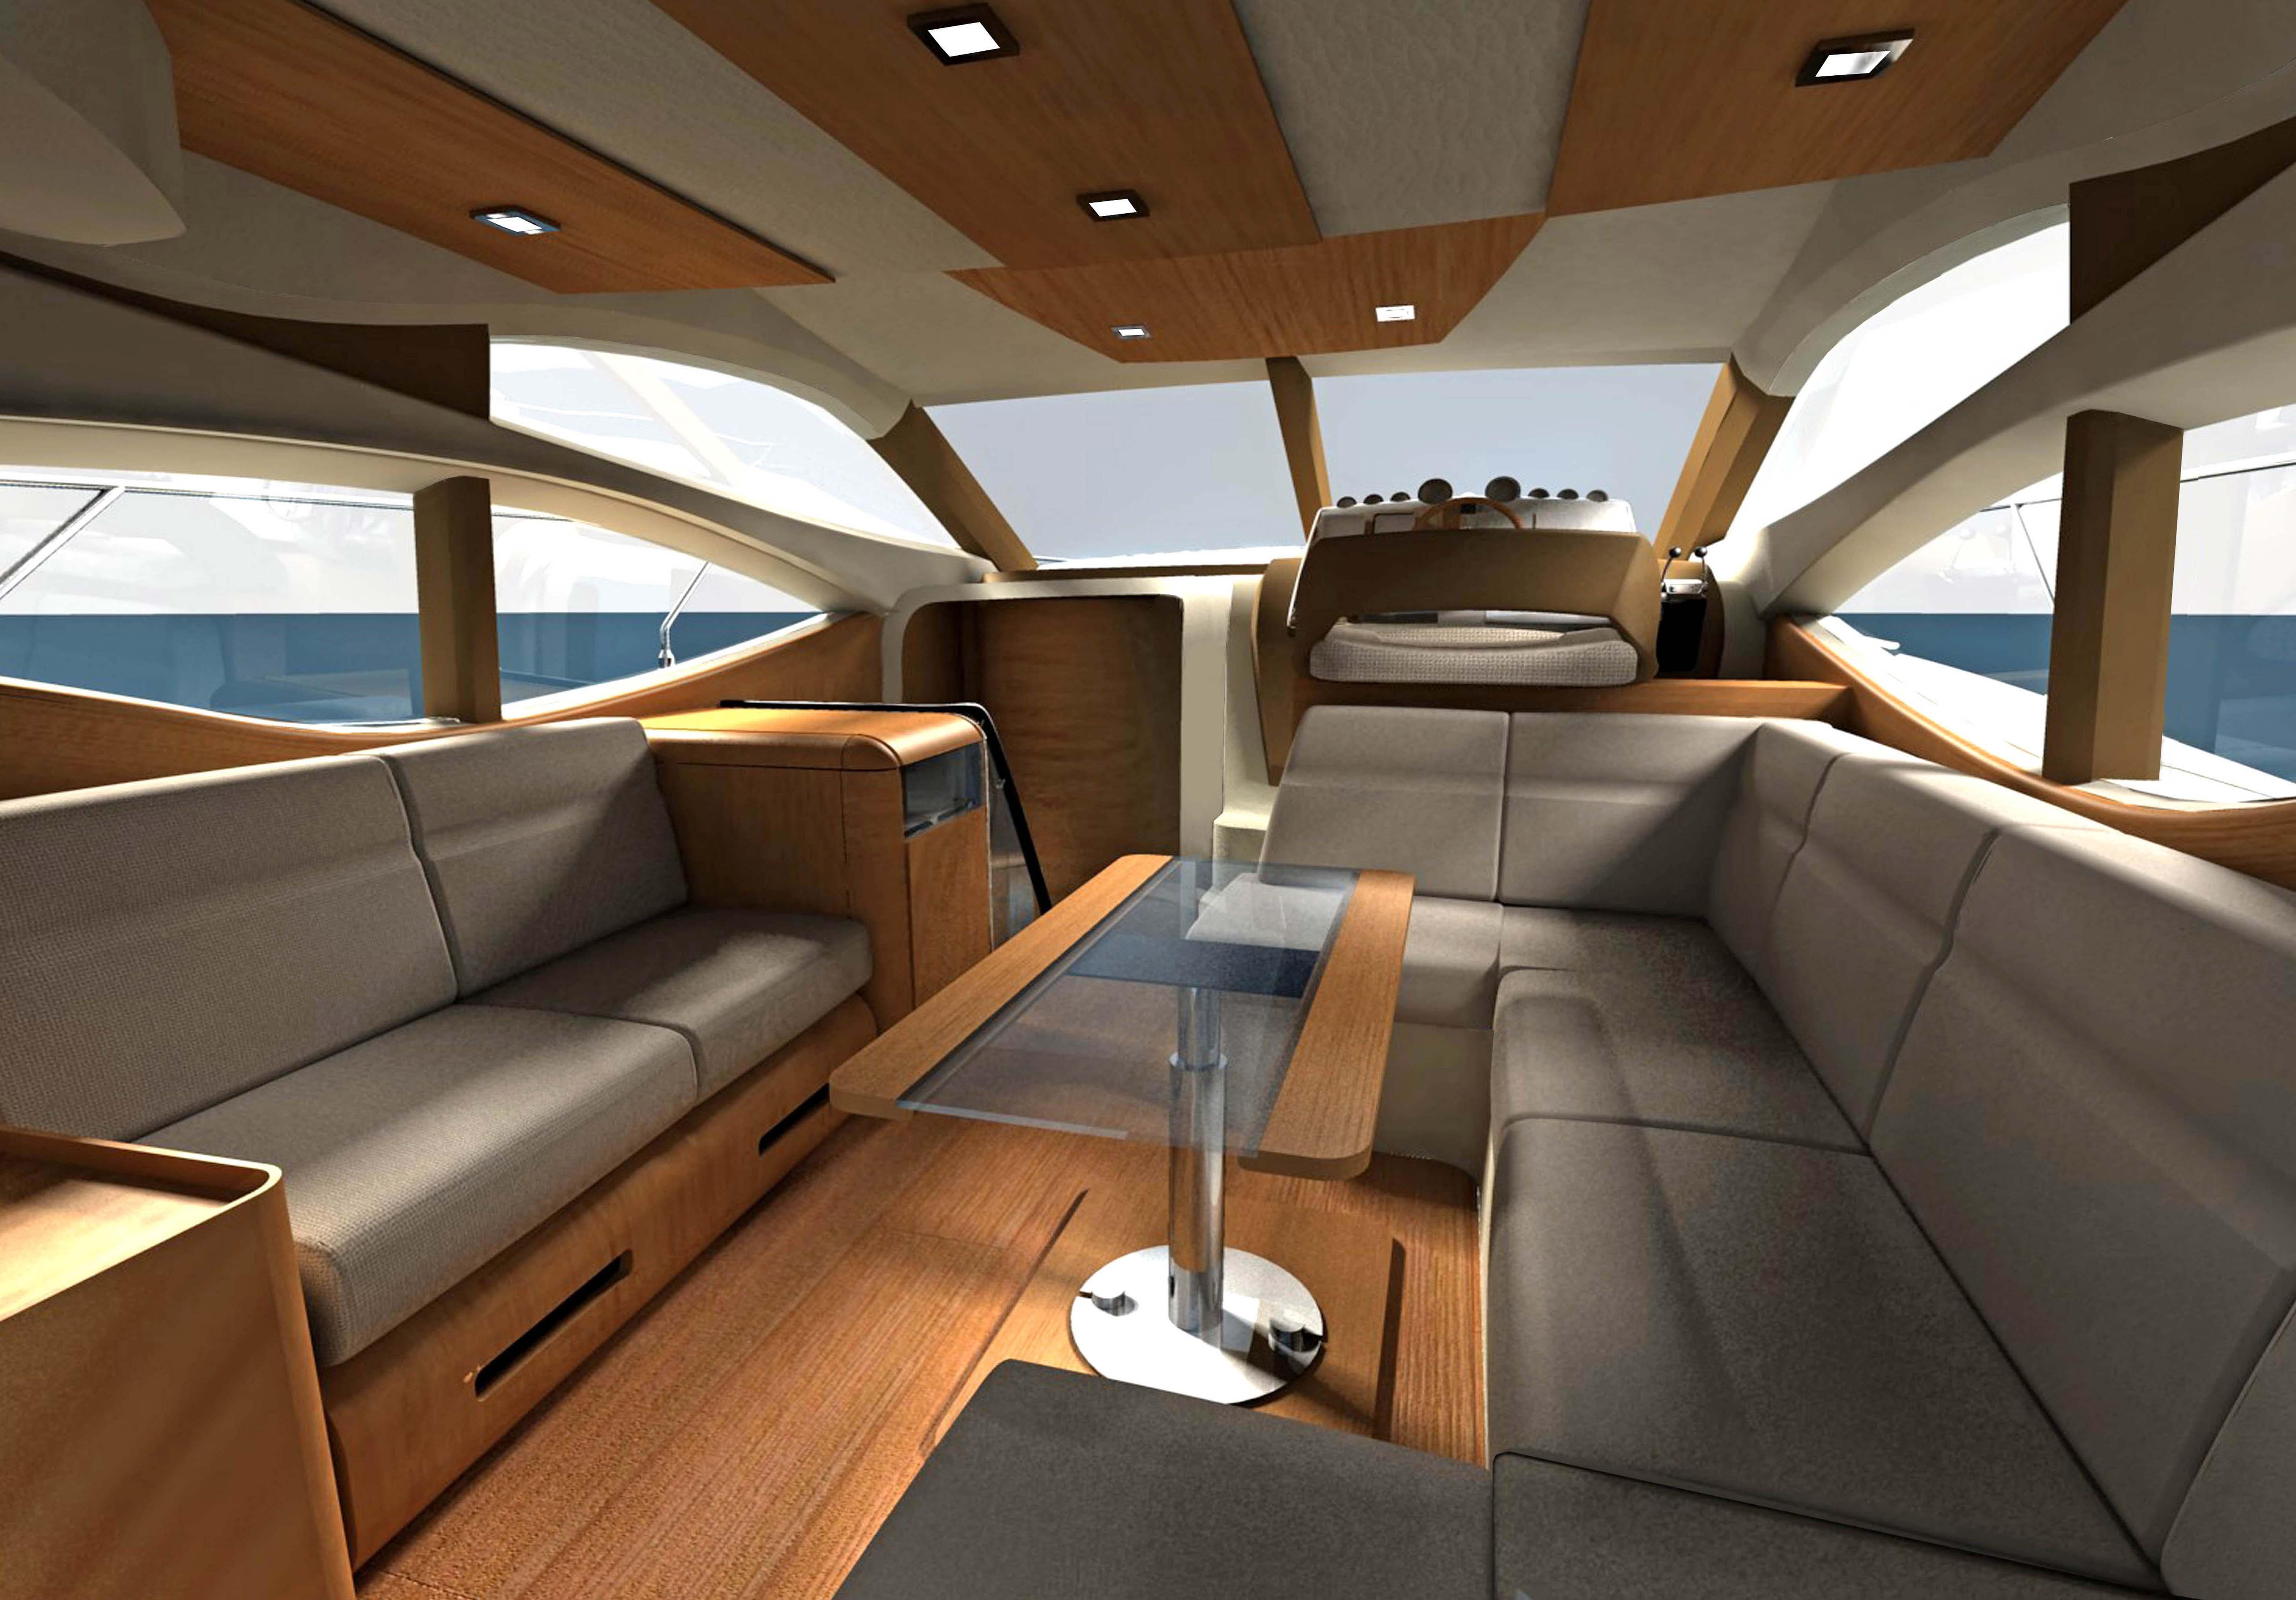 Yacht Design 1 By Julian Garcia At Coroflot.com